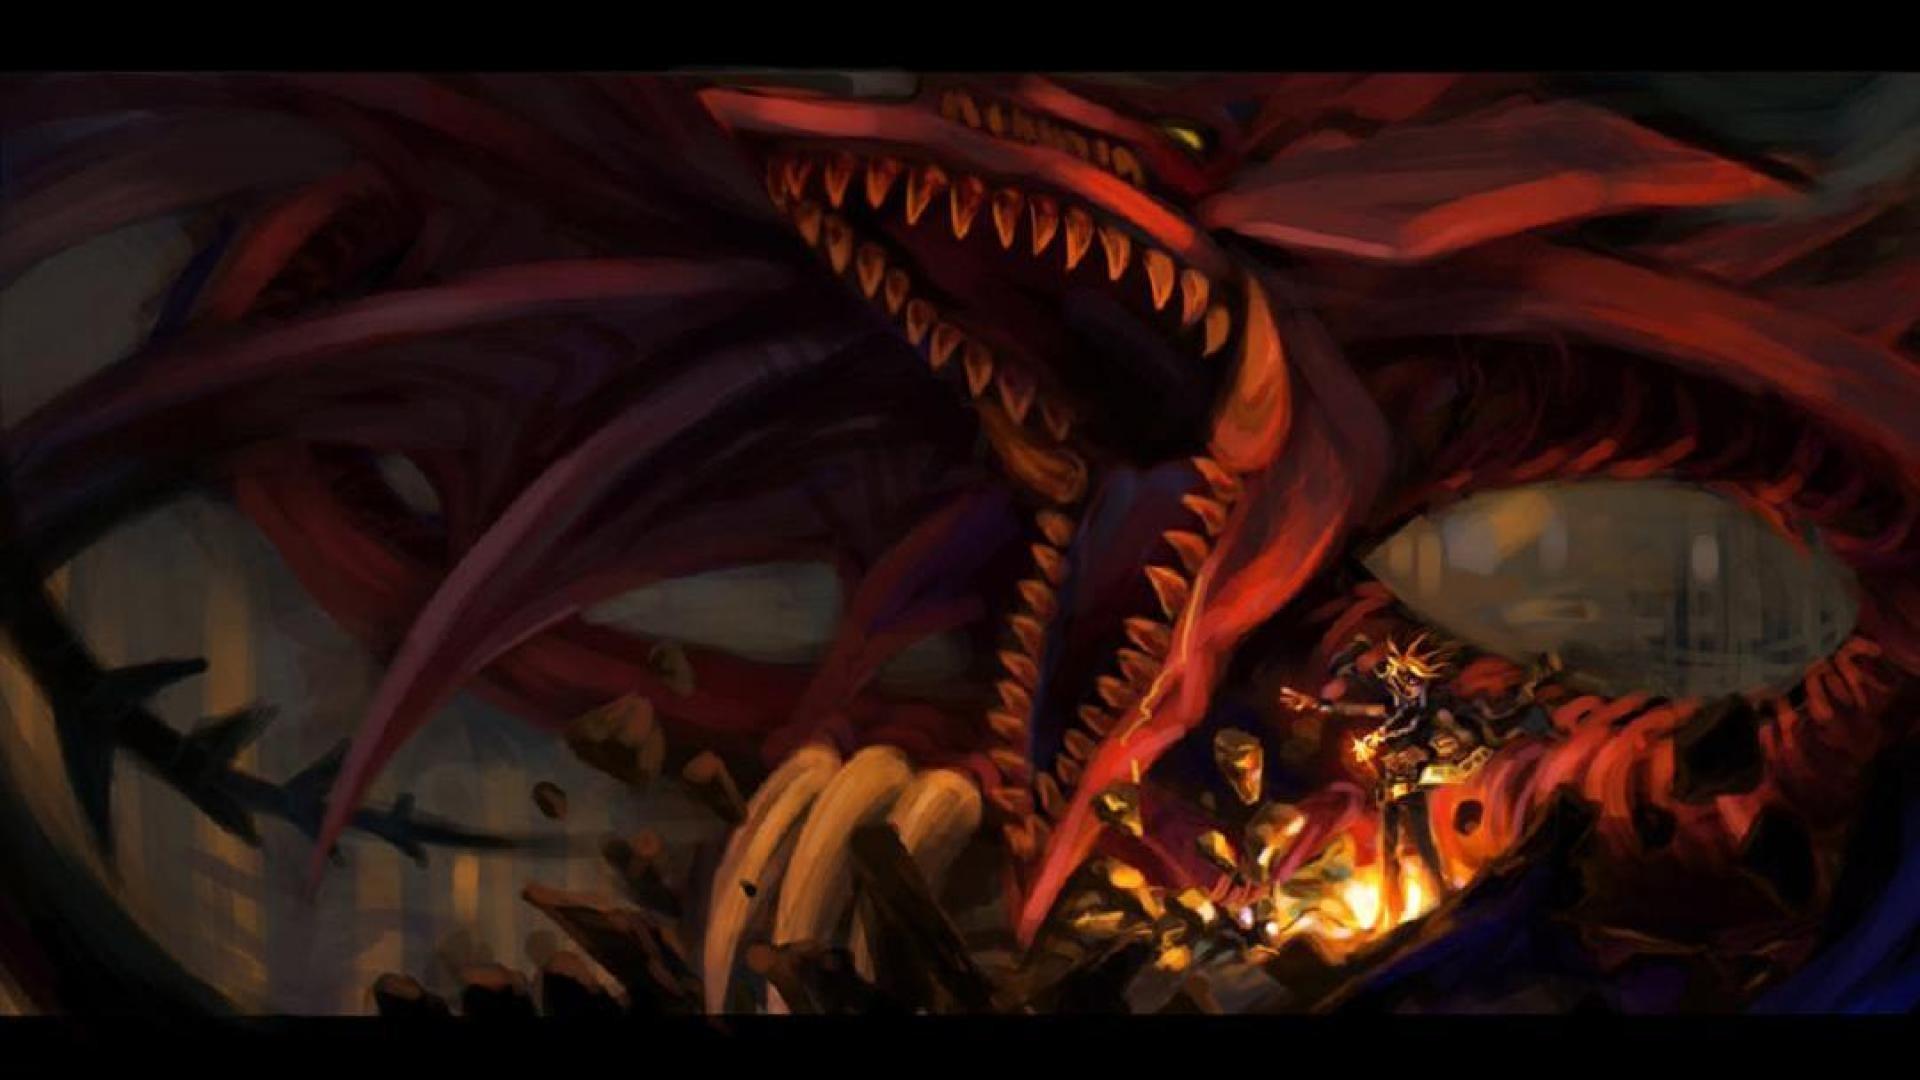 wallpaper: Slifer the Sky Dragon, video games, Yugi, Yu-Gi-